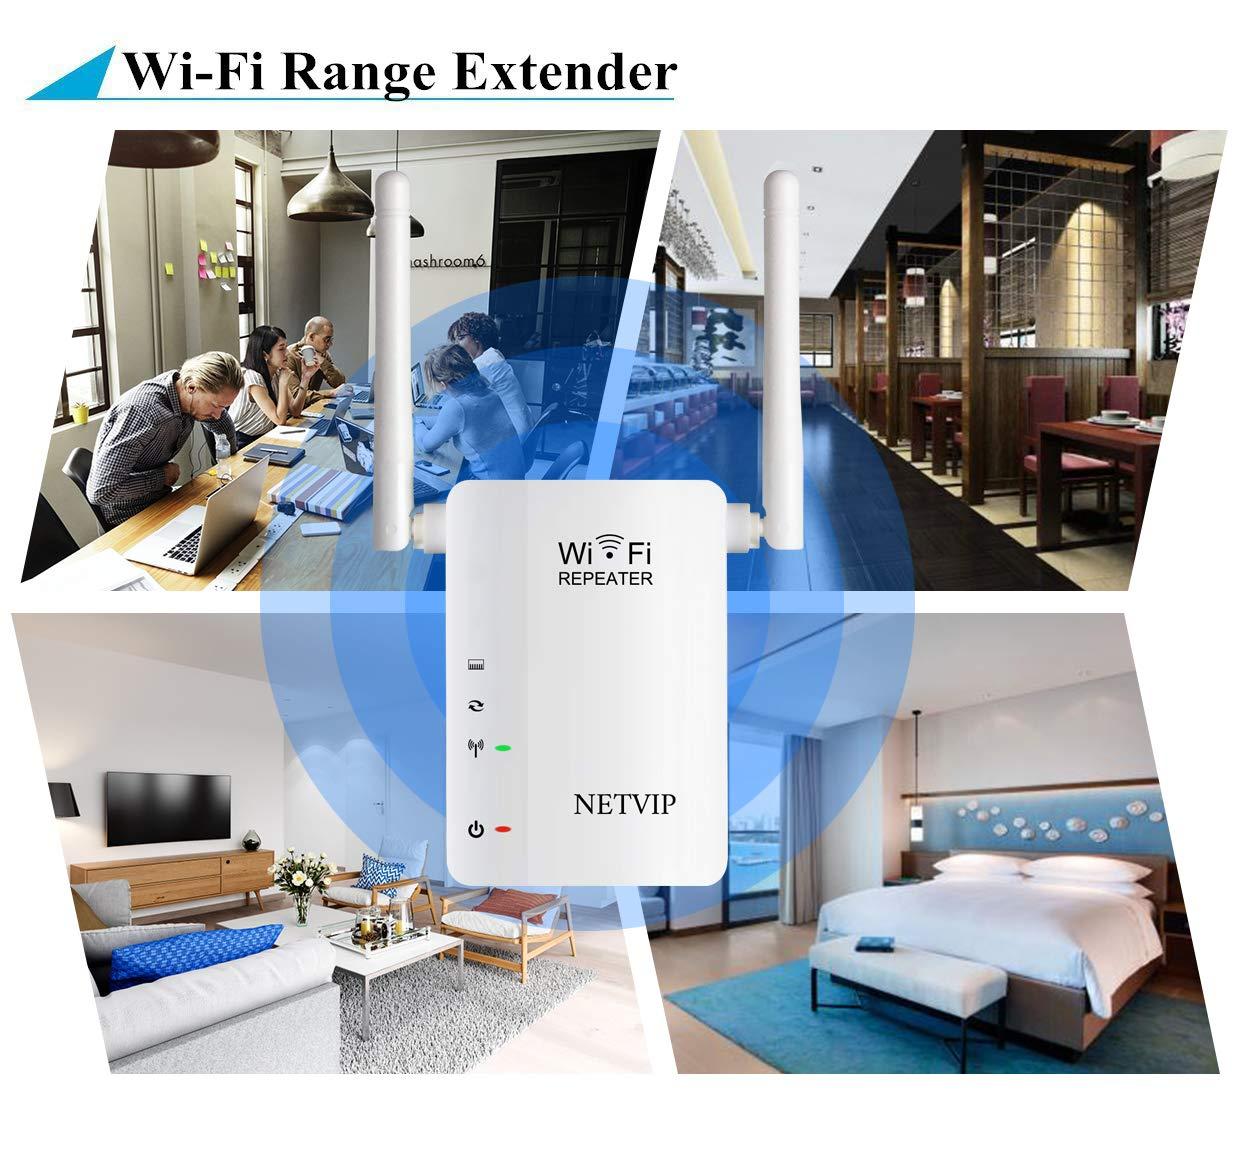 1 Port,2 Betriebs Modi,2 Externer Antennen verst/ärker NETVIP WLAN Repeater Verst/ärker Wireless Repeater Signal WLAN Verstaerker Kompatibel Mit Allen WLAN Ger/äten 300Mbit//s, 2.4GHz Schwarz